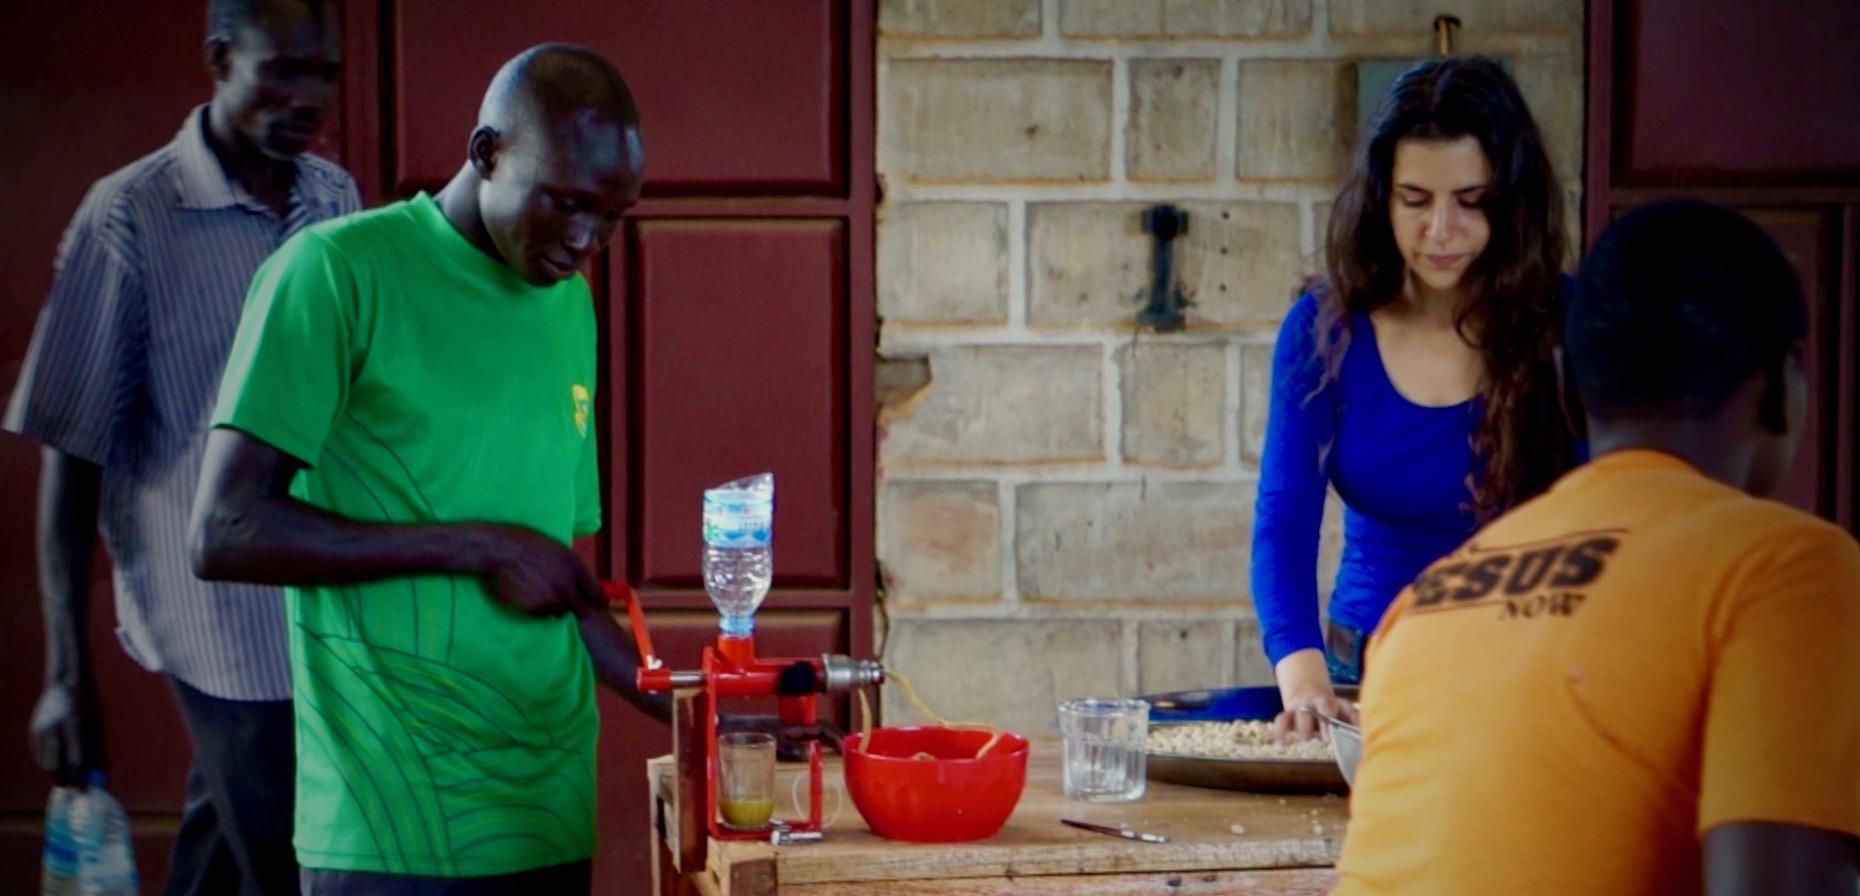 First Desert Date Oil Pressing - Yei, South Sudan 2014